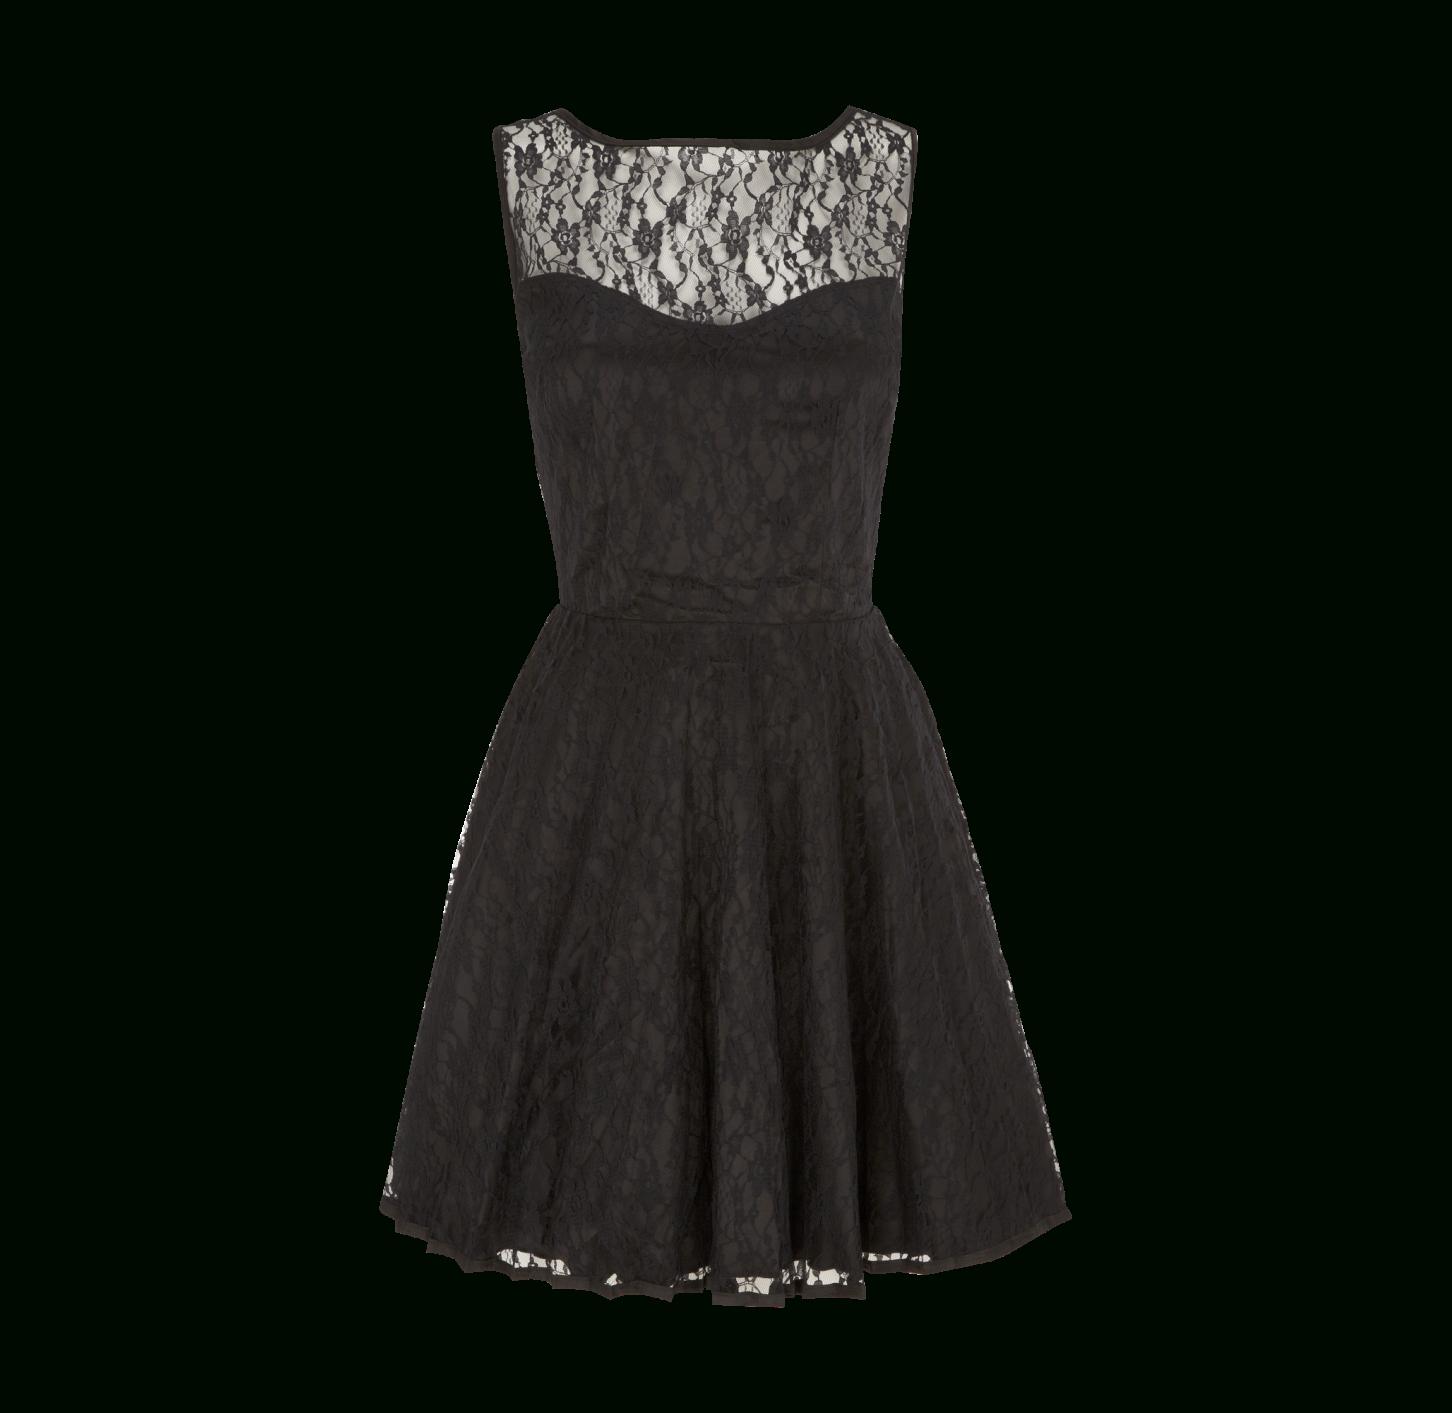 Designer Perfekt Abendkleidung Damen C&A Bester Preis20 Luxurius Abendkleidung Damen C&A Design